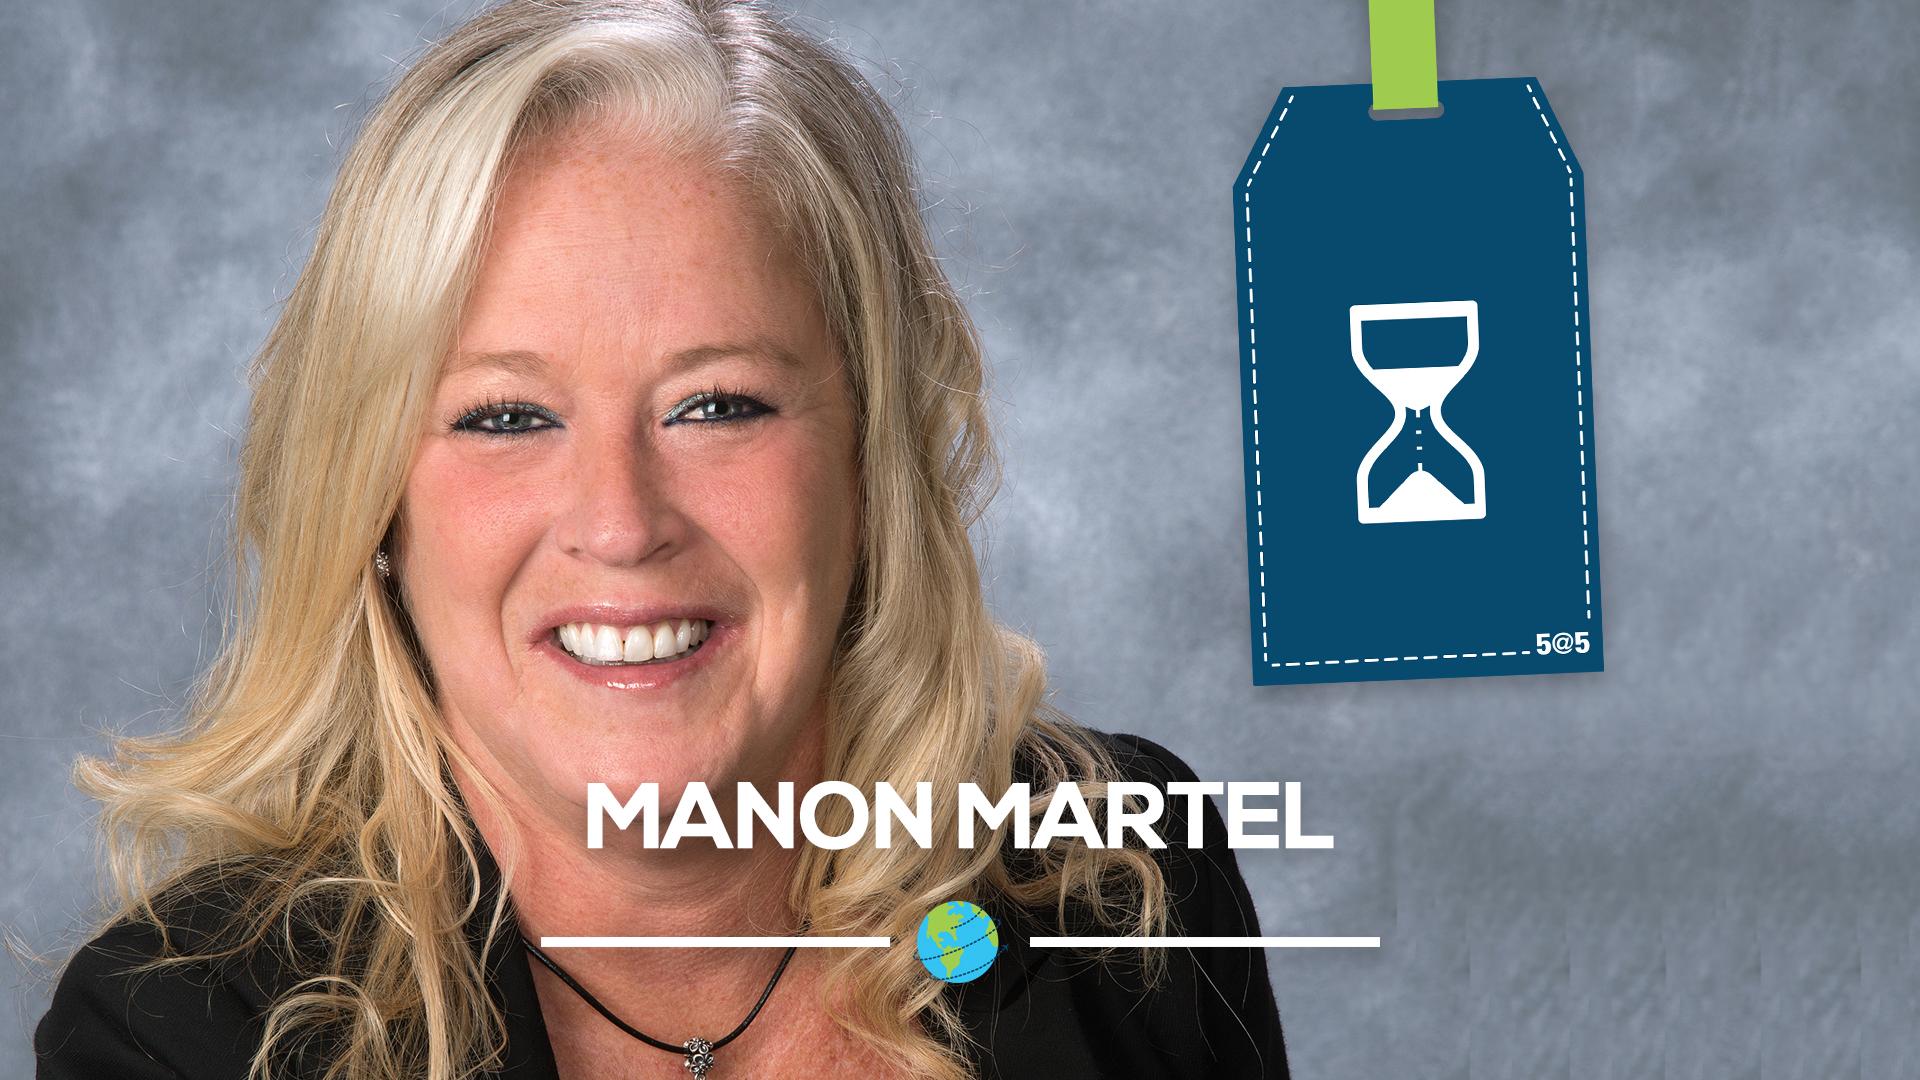 Manon Martel